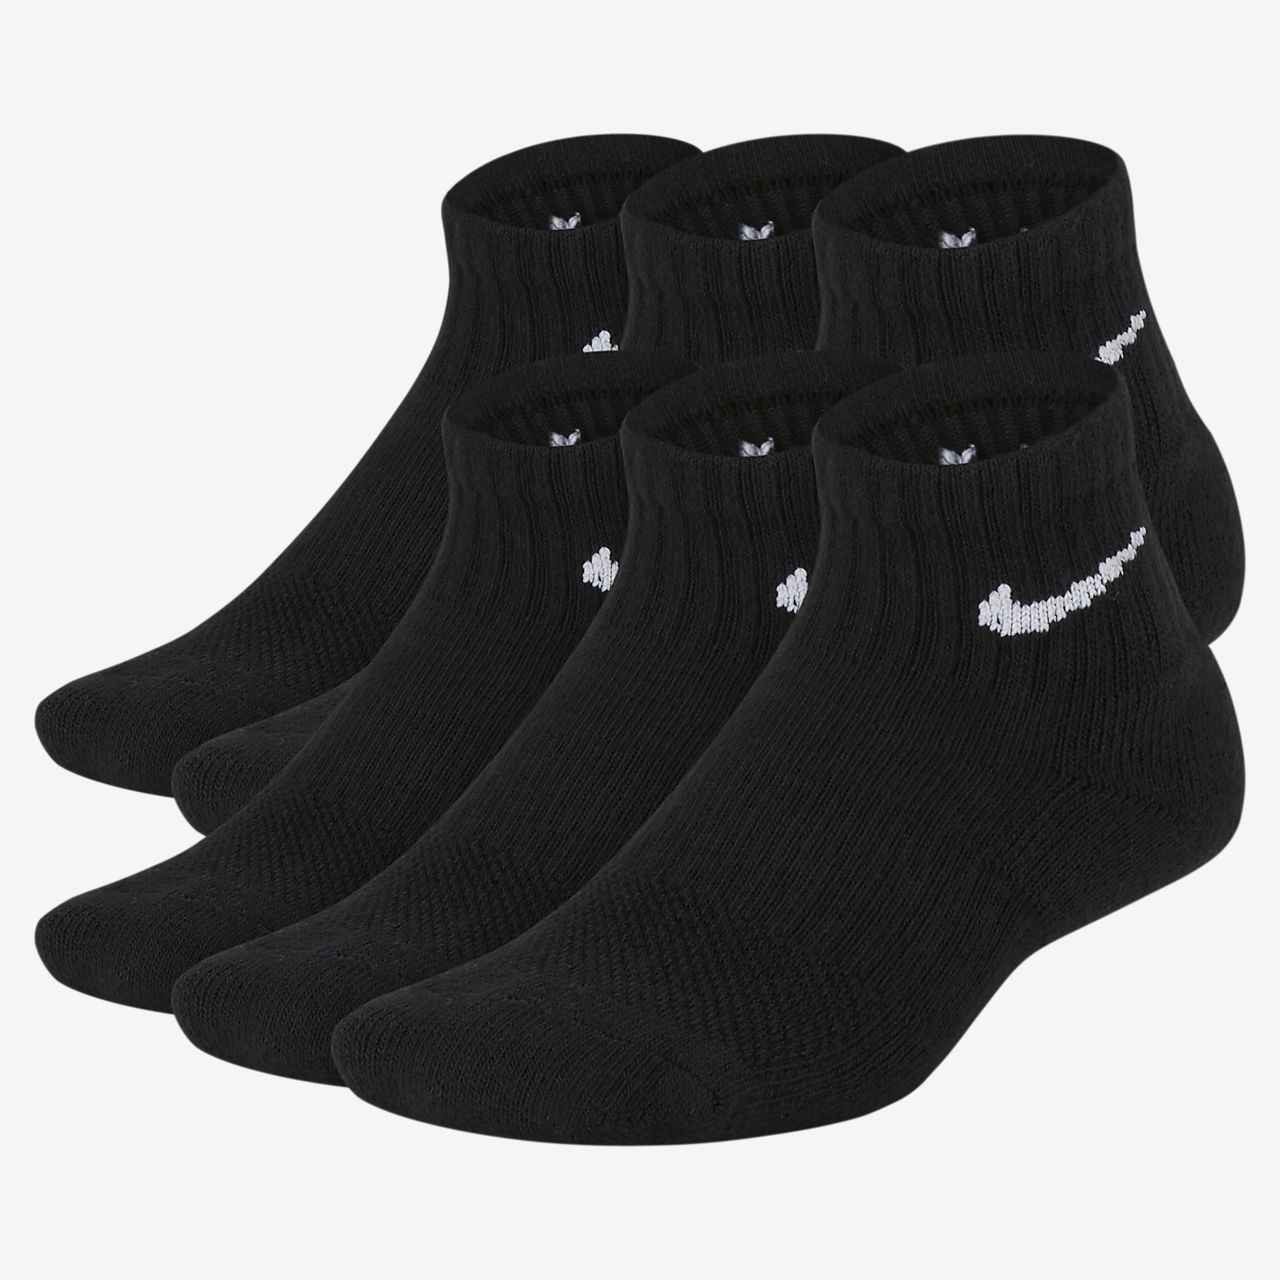 Nike Performance Cushioned Quarter Kids' Training Socks (6 Pair)